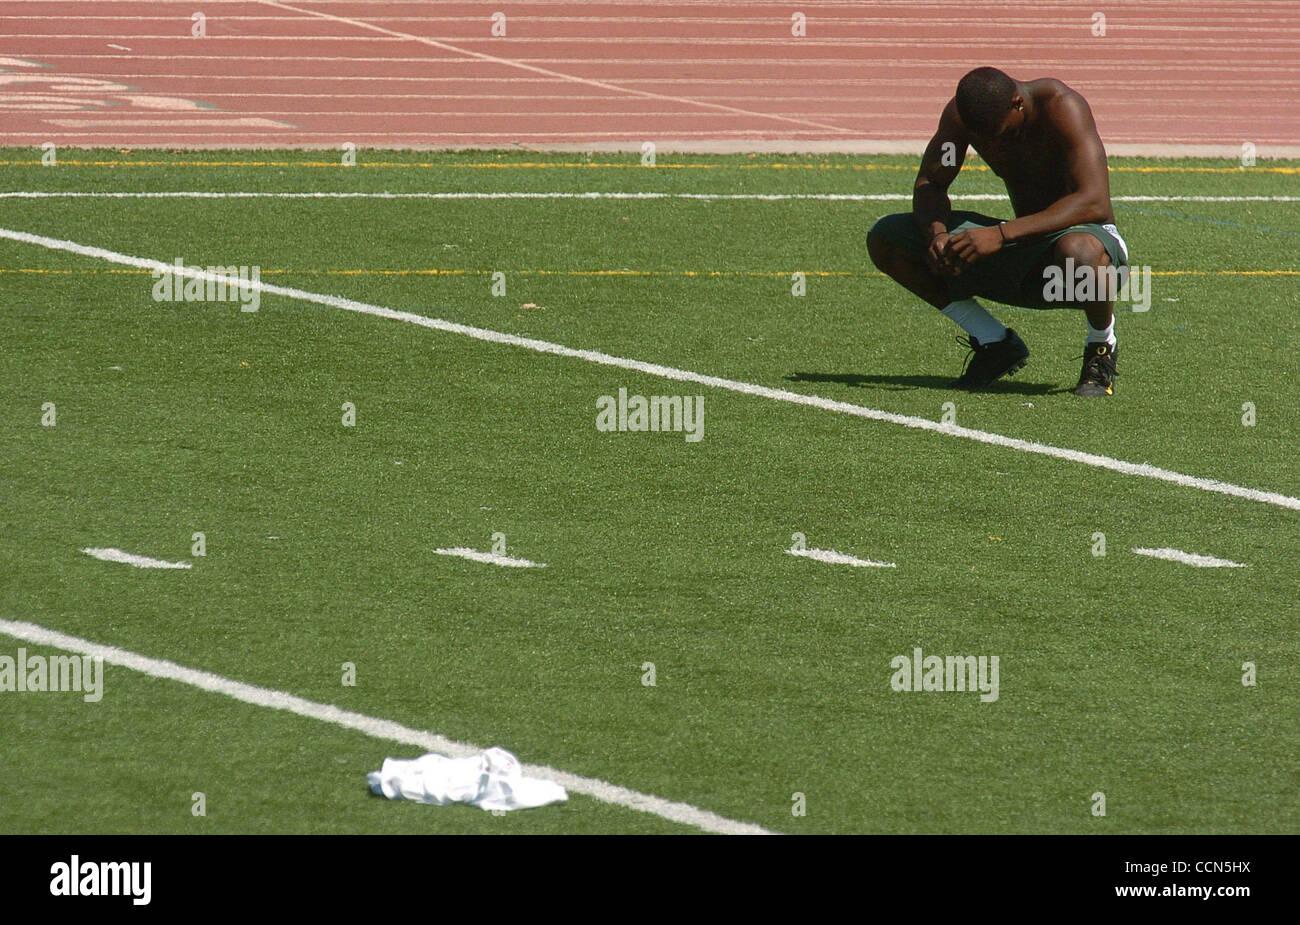 Former De La Salle Football Player Cameron Colvin Takes A Break Stock Photo Alamy